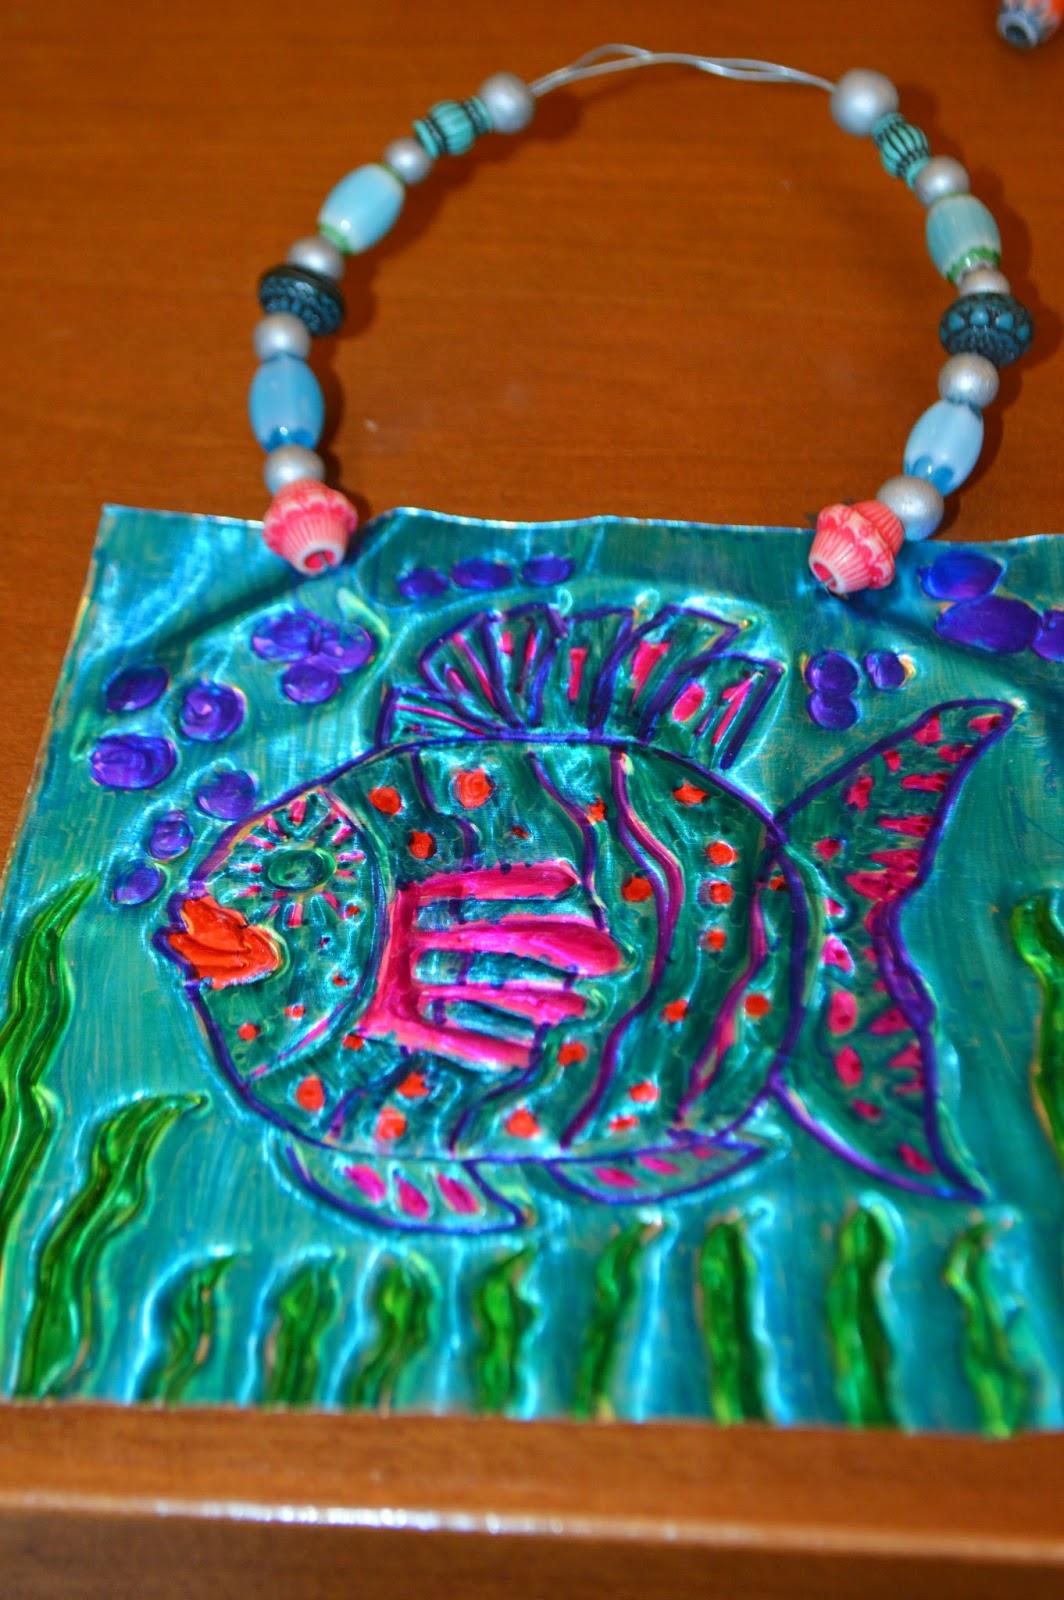 Christie s Creative Cupboard Mexican Tin Art at Portola Valley